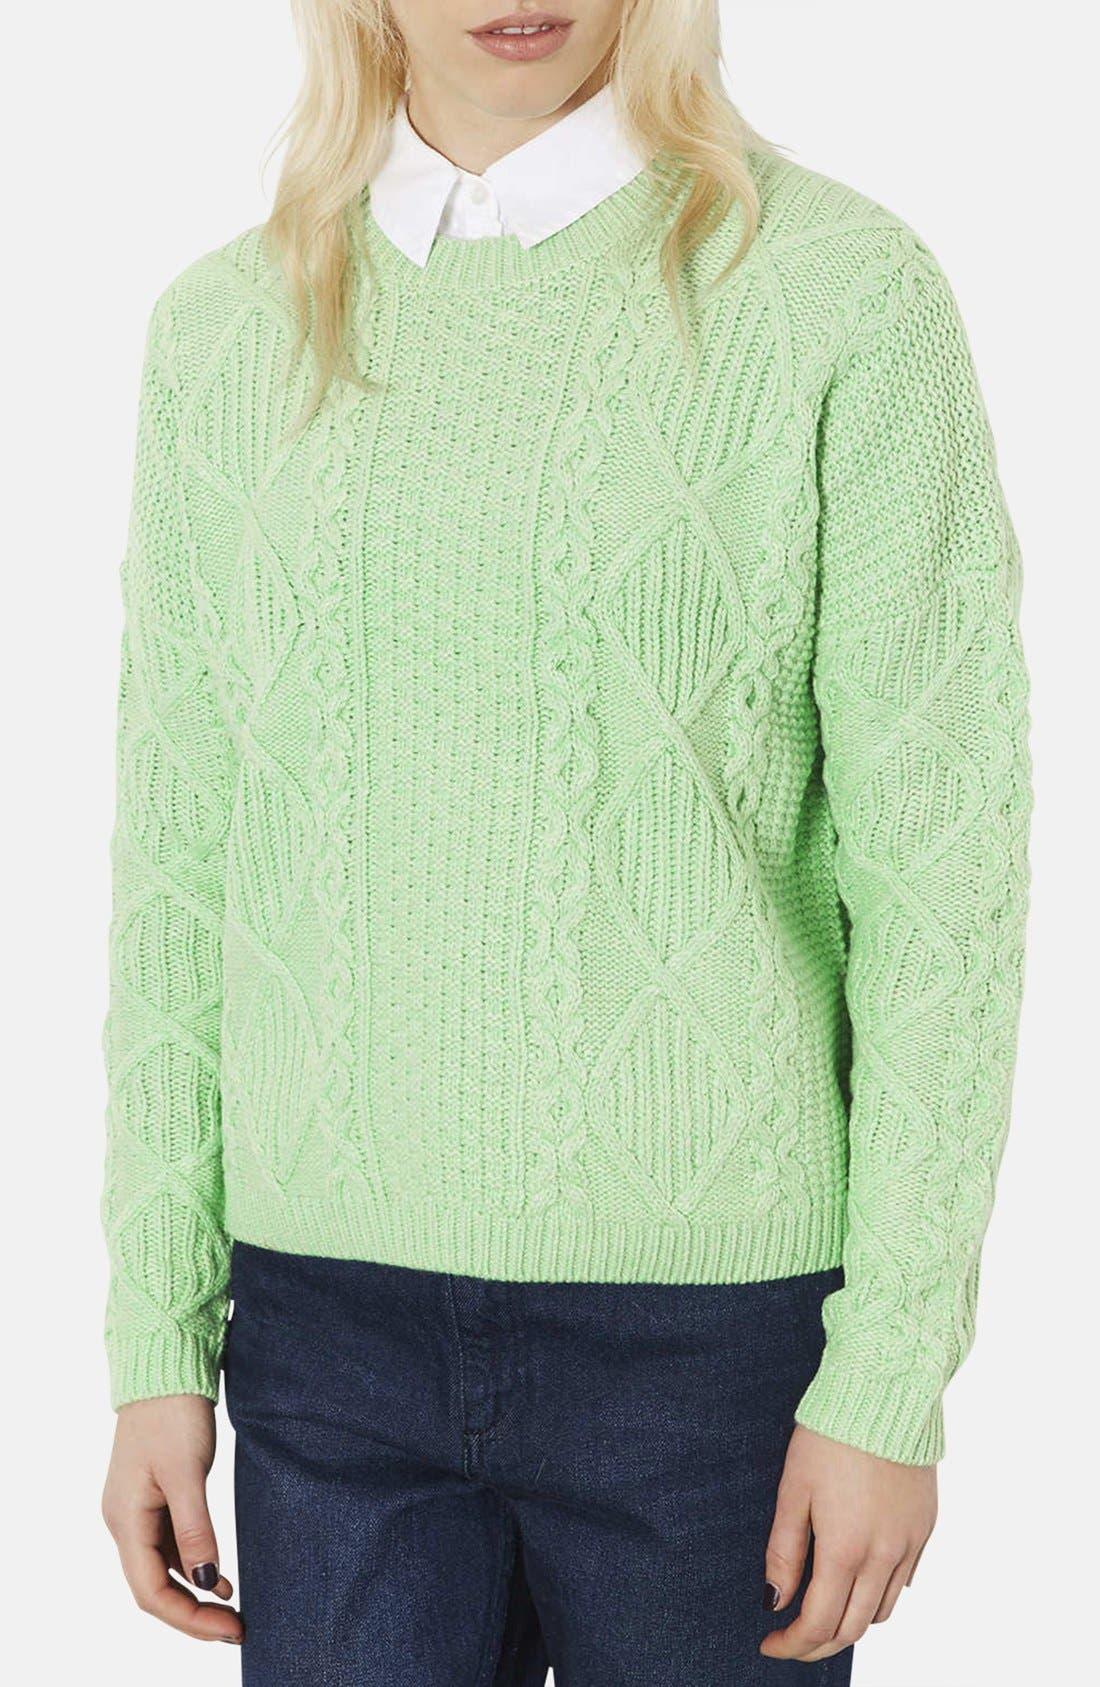 TOPSHOP, Crewneck Cable Knit Sweater, Main thumbnail 1, color, 340